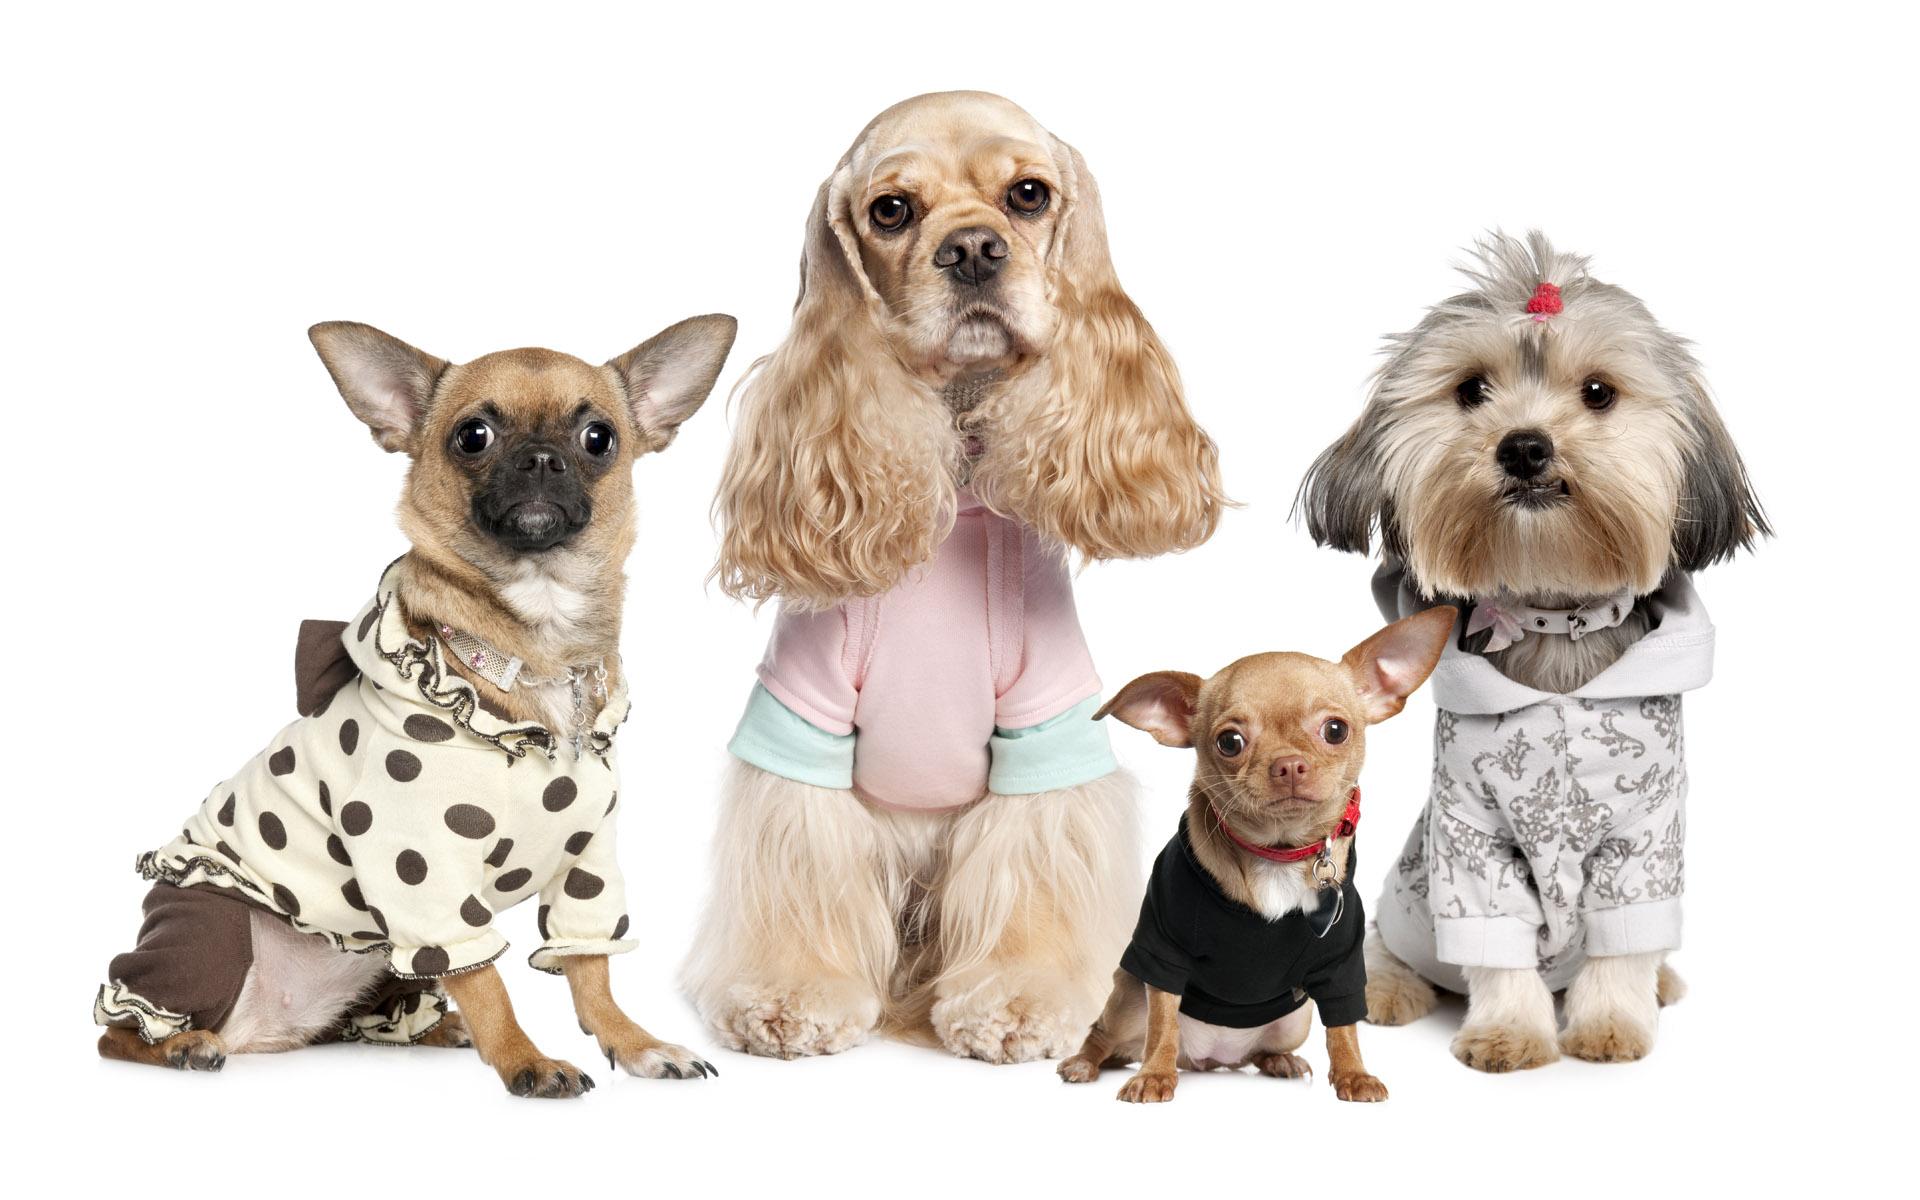 Funny Dog Wallpaper Animal - Dog Wallpaper